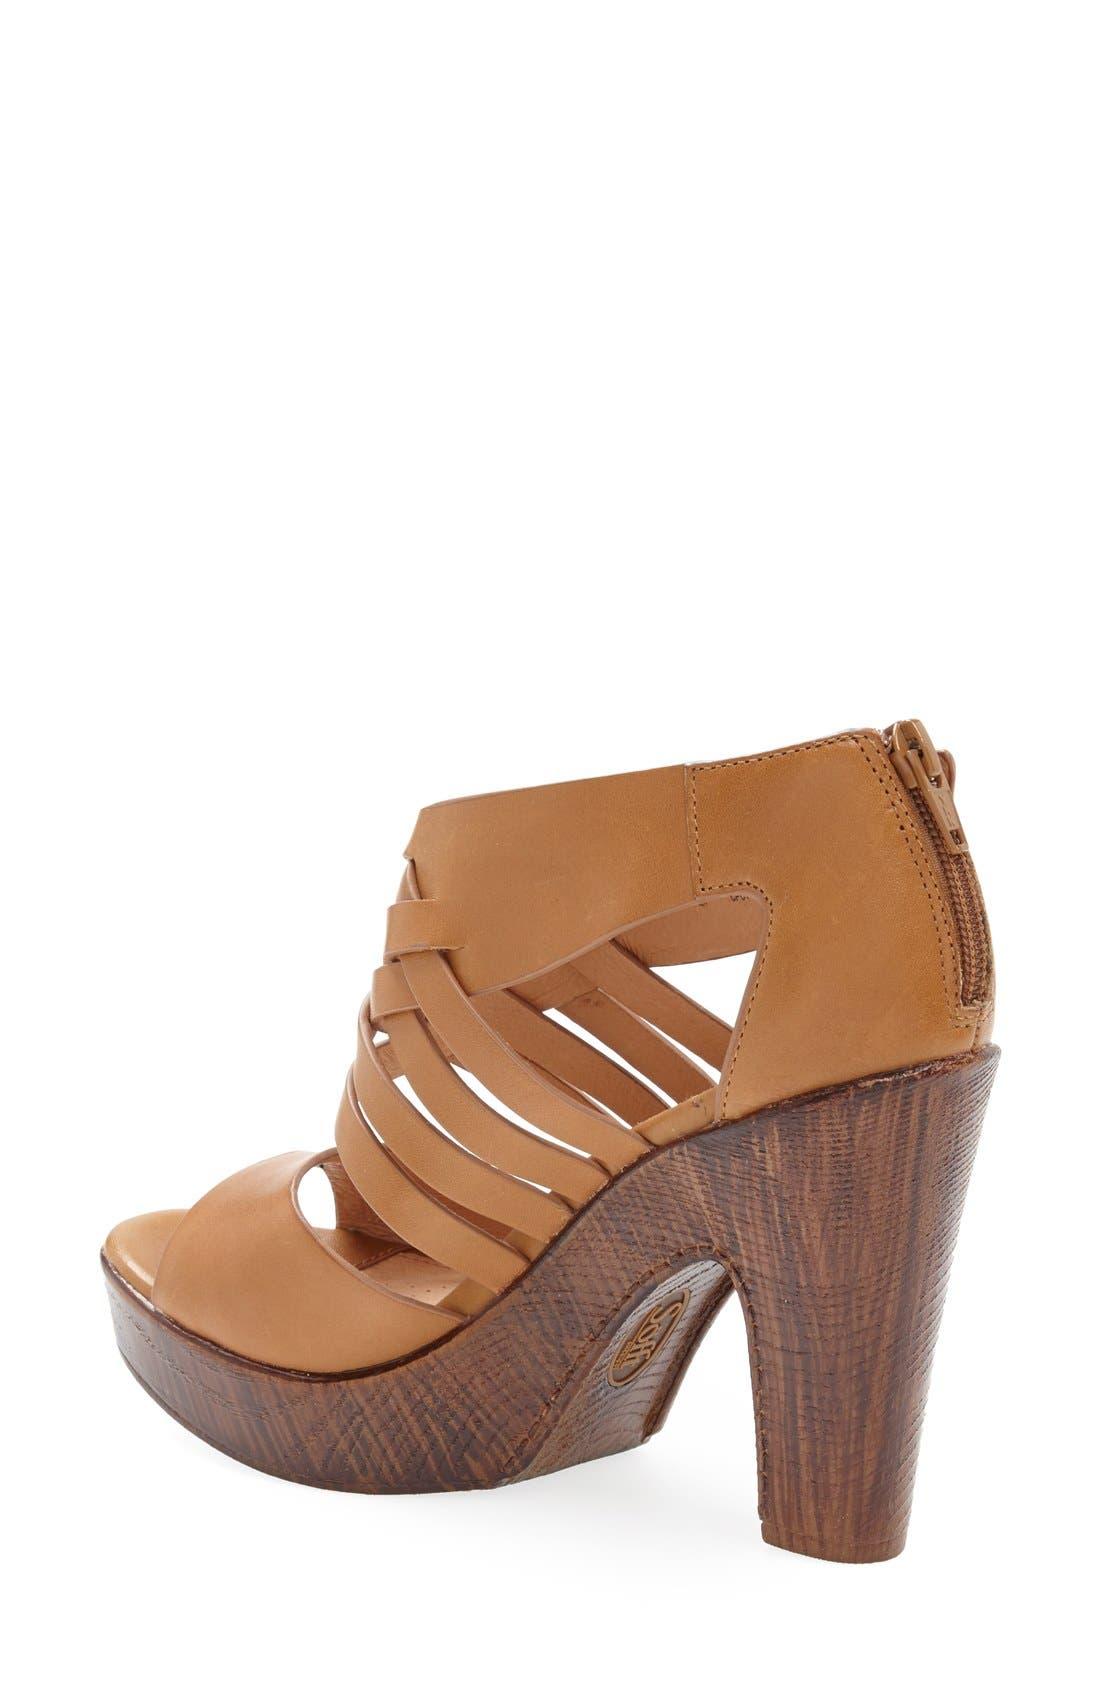 Alternate Image 2  - Söfft 'Ohanna' Leather Sandal (Women)